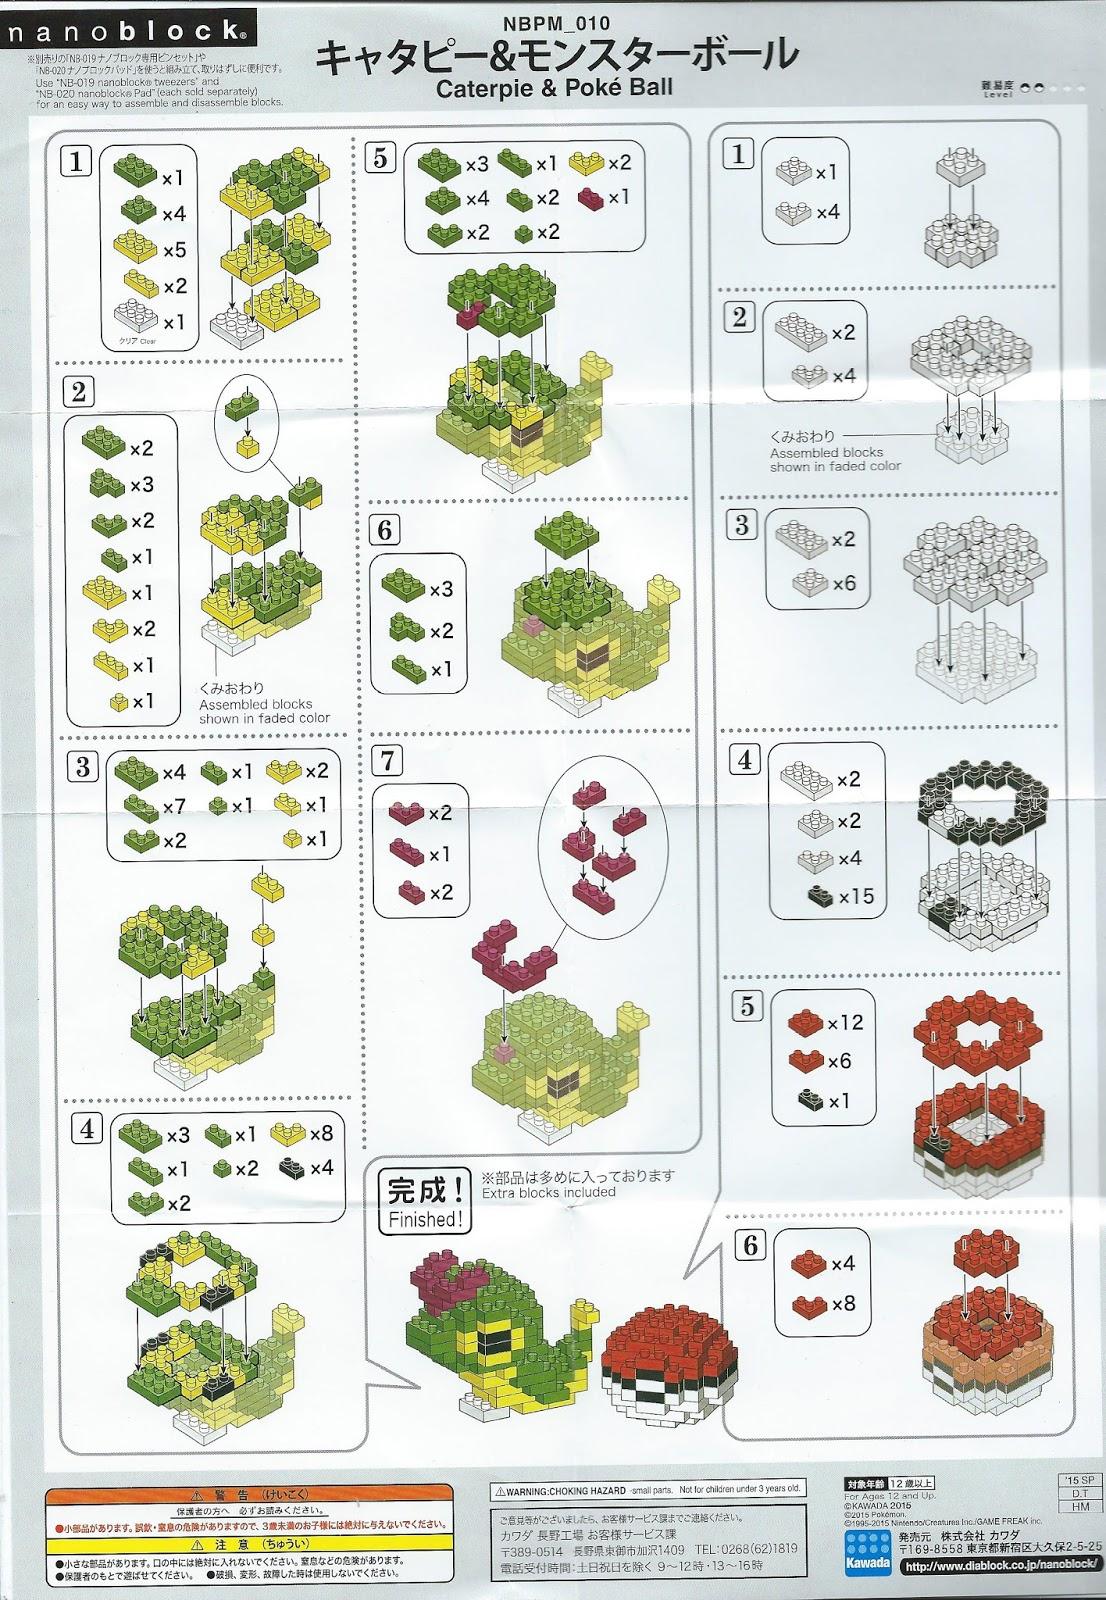 lets talk it out pokemon nanoblock instruction sheet